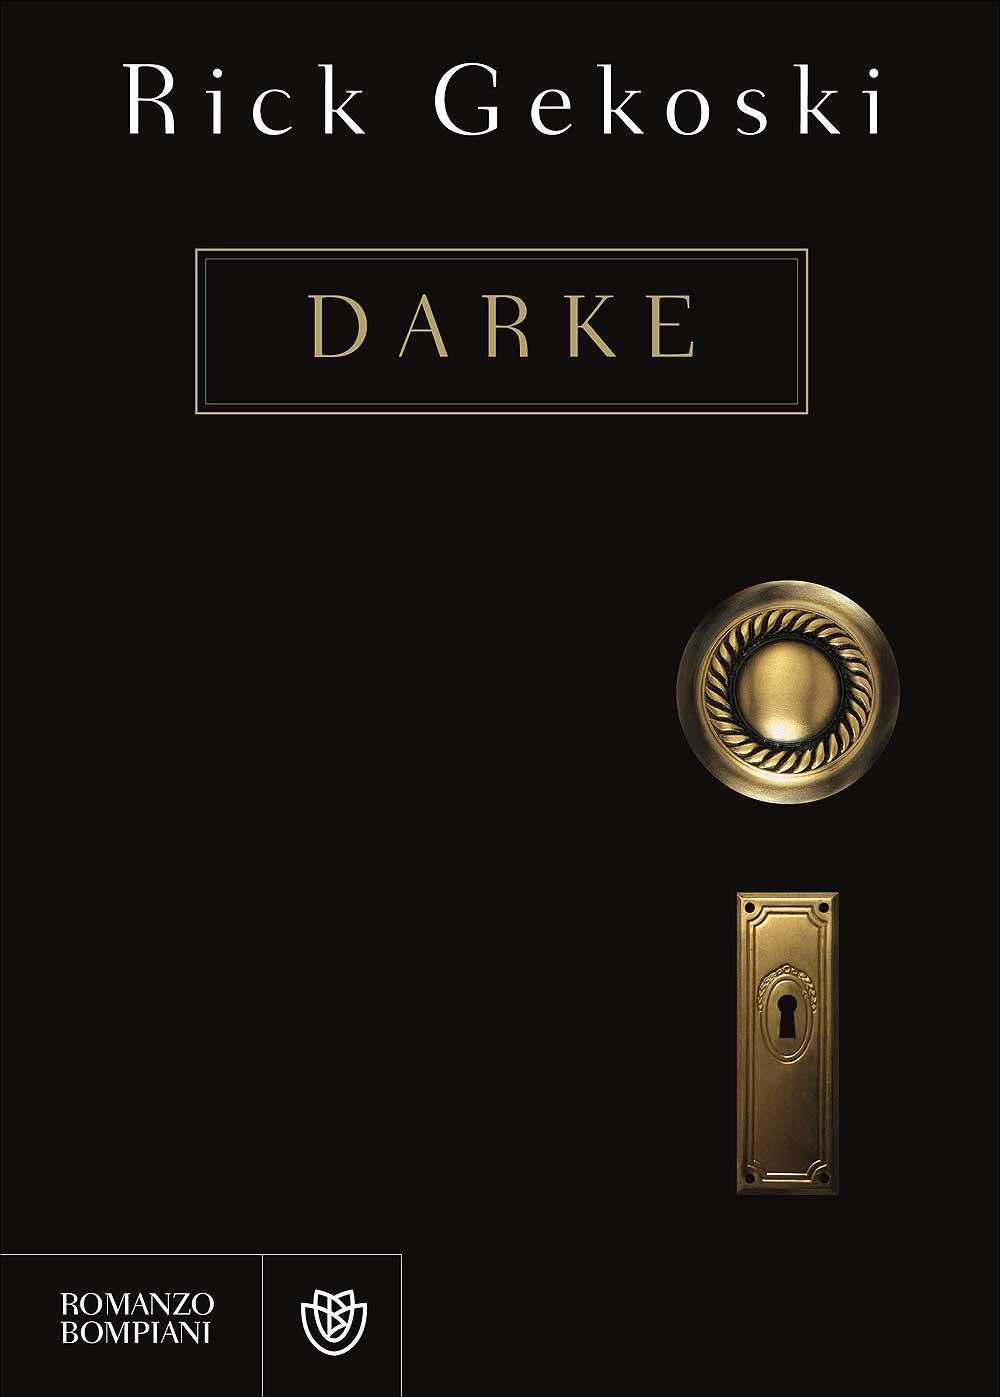 Darke – Rick Gekoski